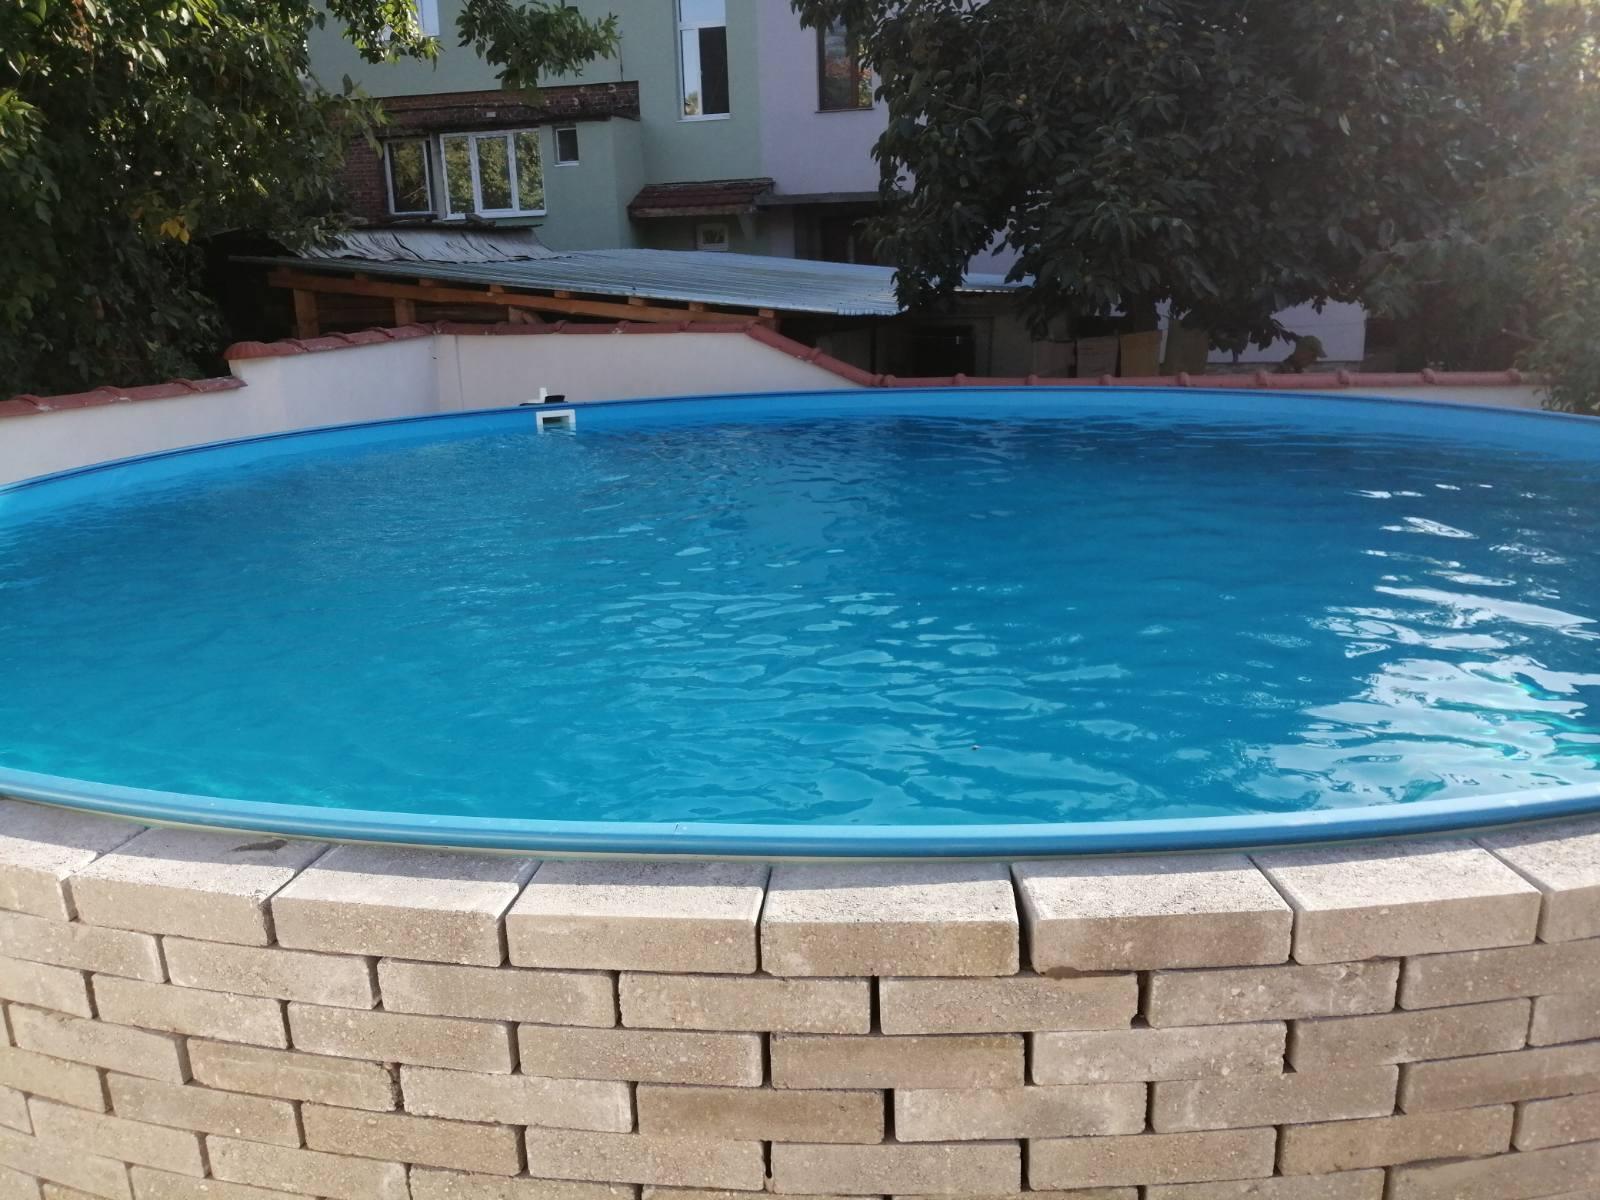 izgrajdane-basein-plovdiv-3